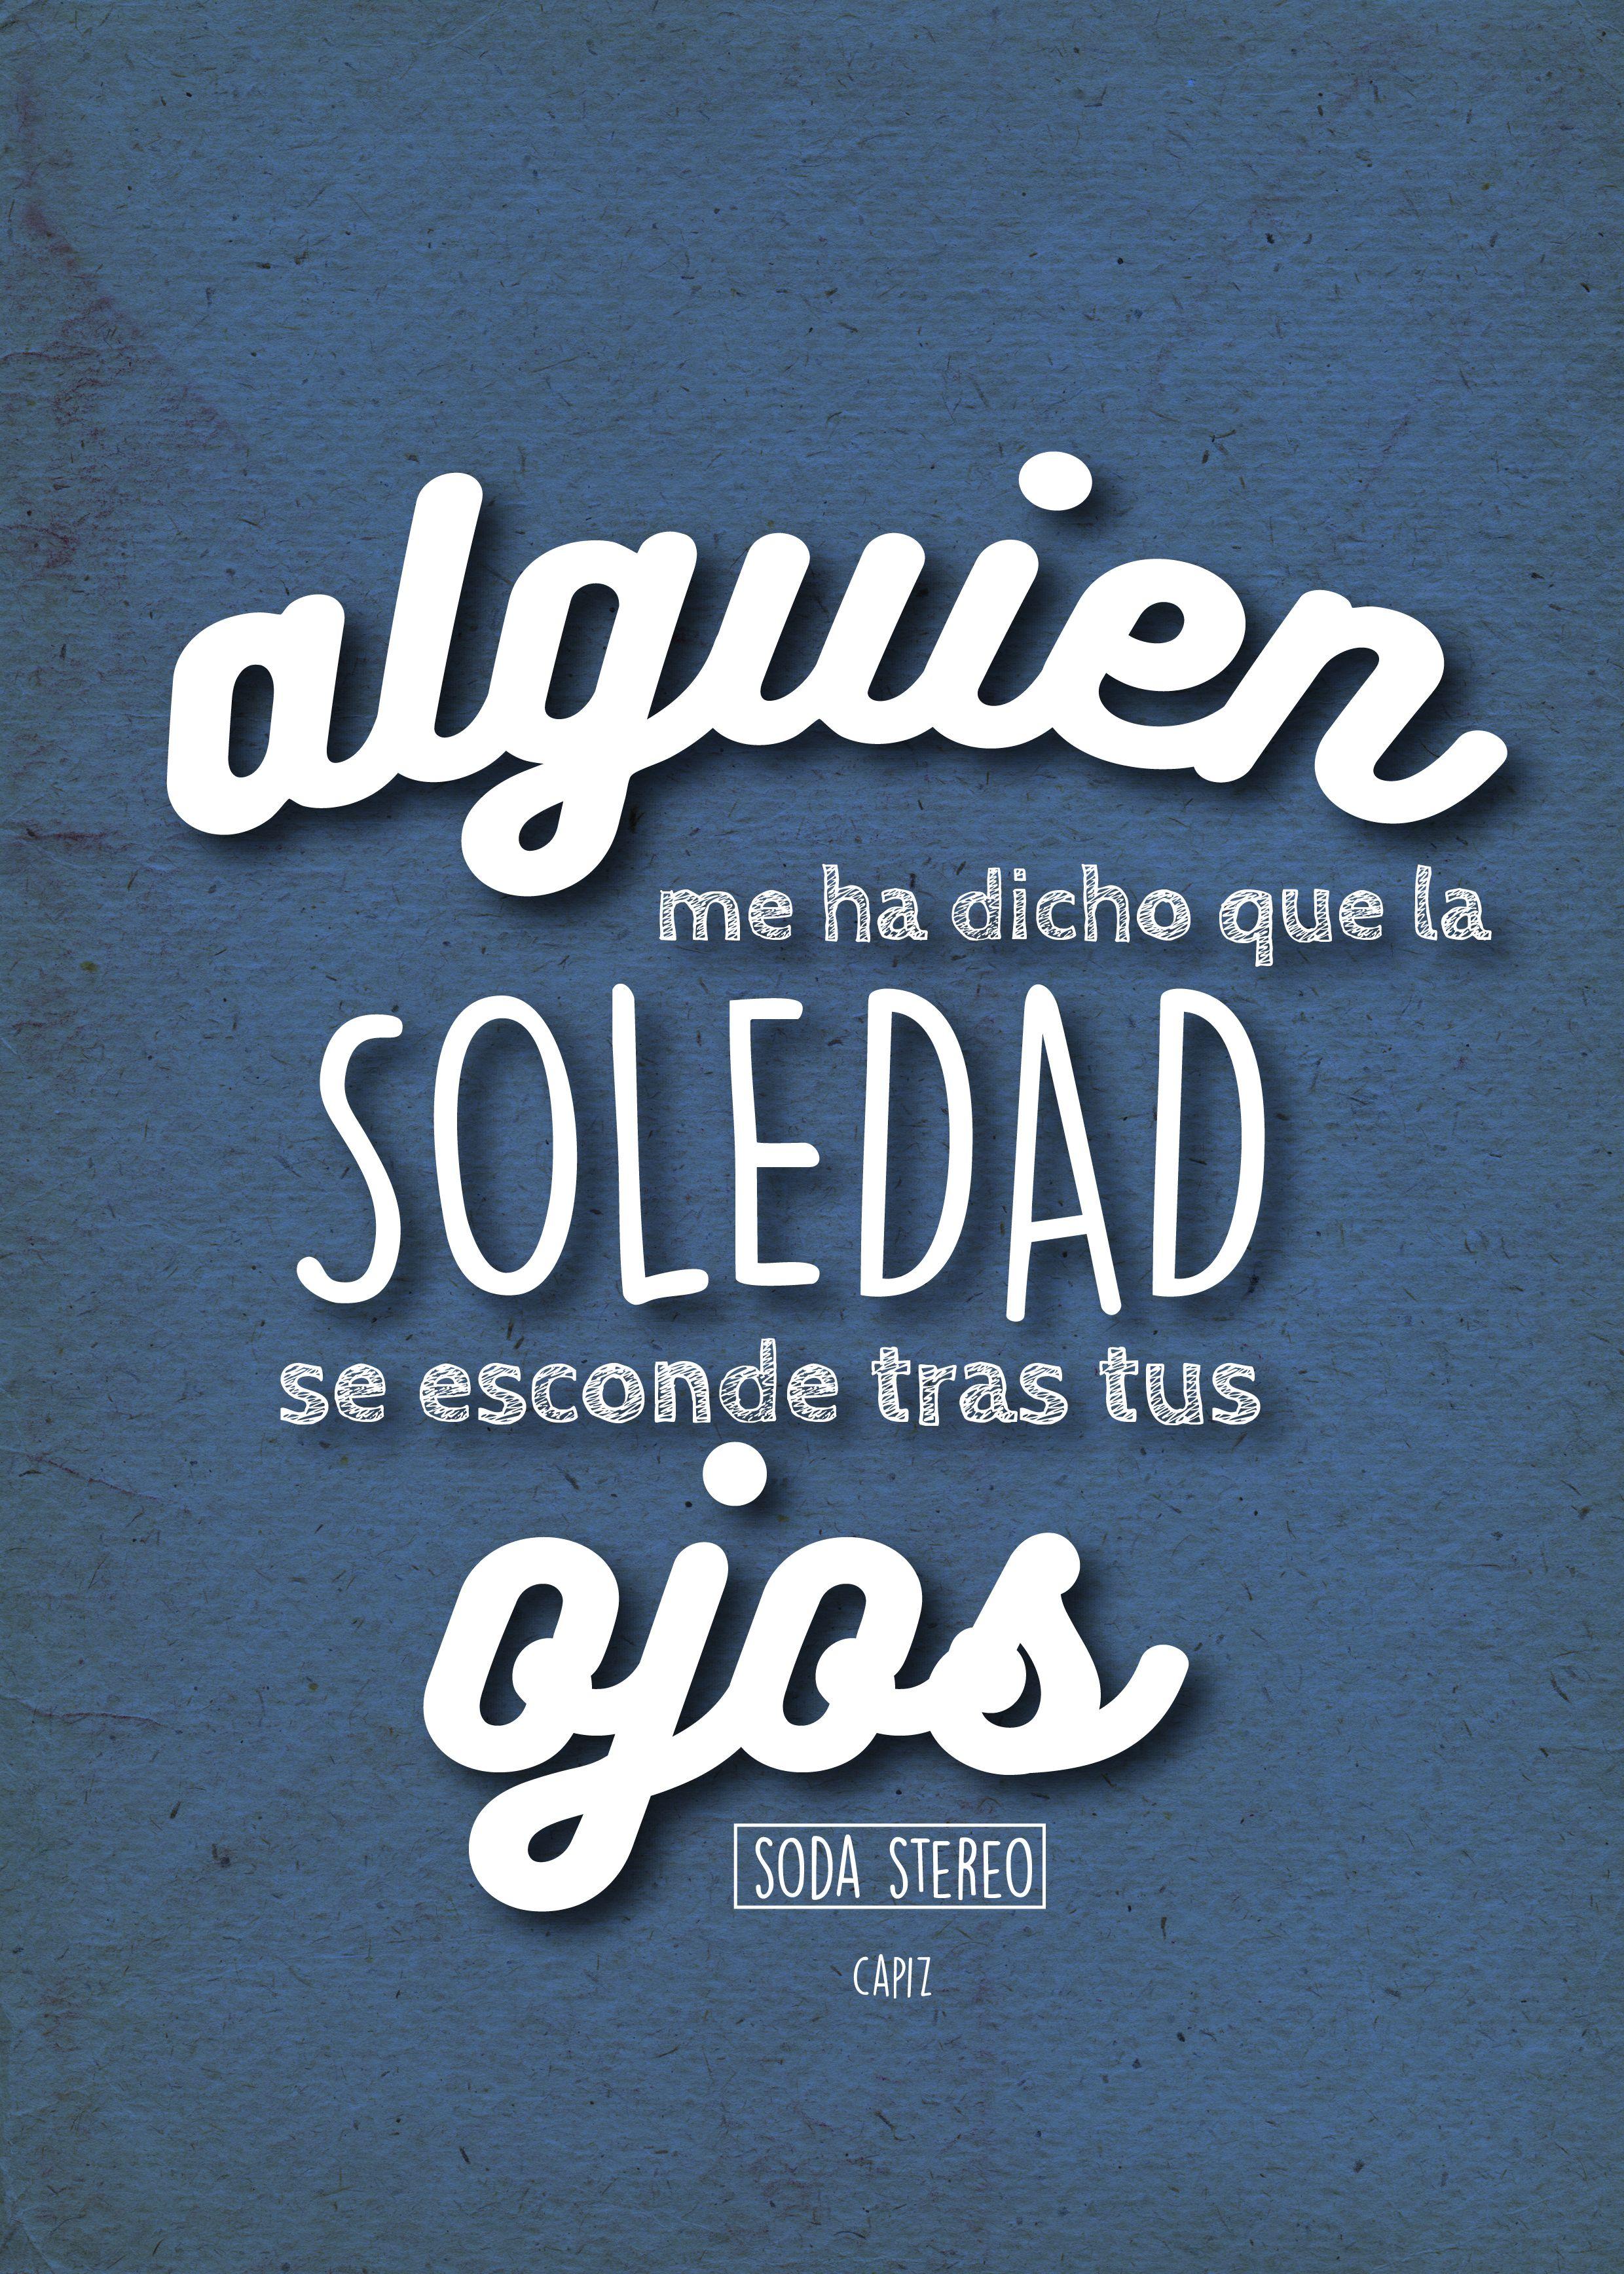 Soda Stereo Frases De Rock Soda Estereo Letras Y Frases